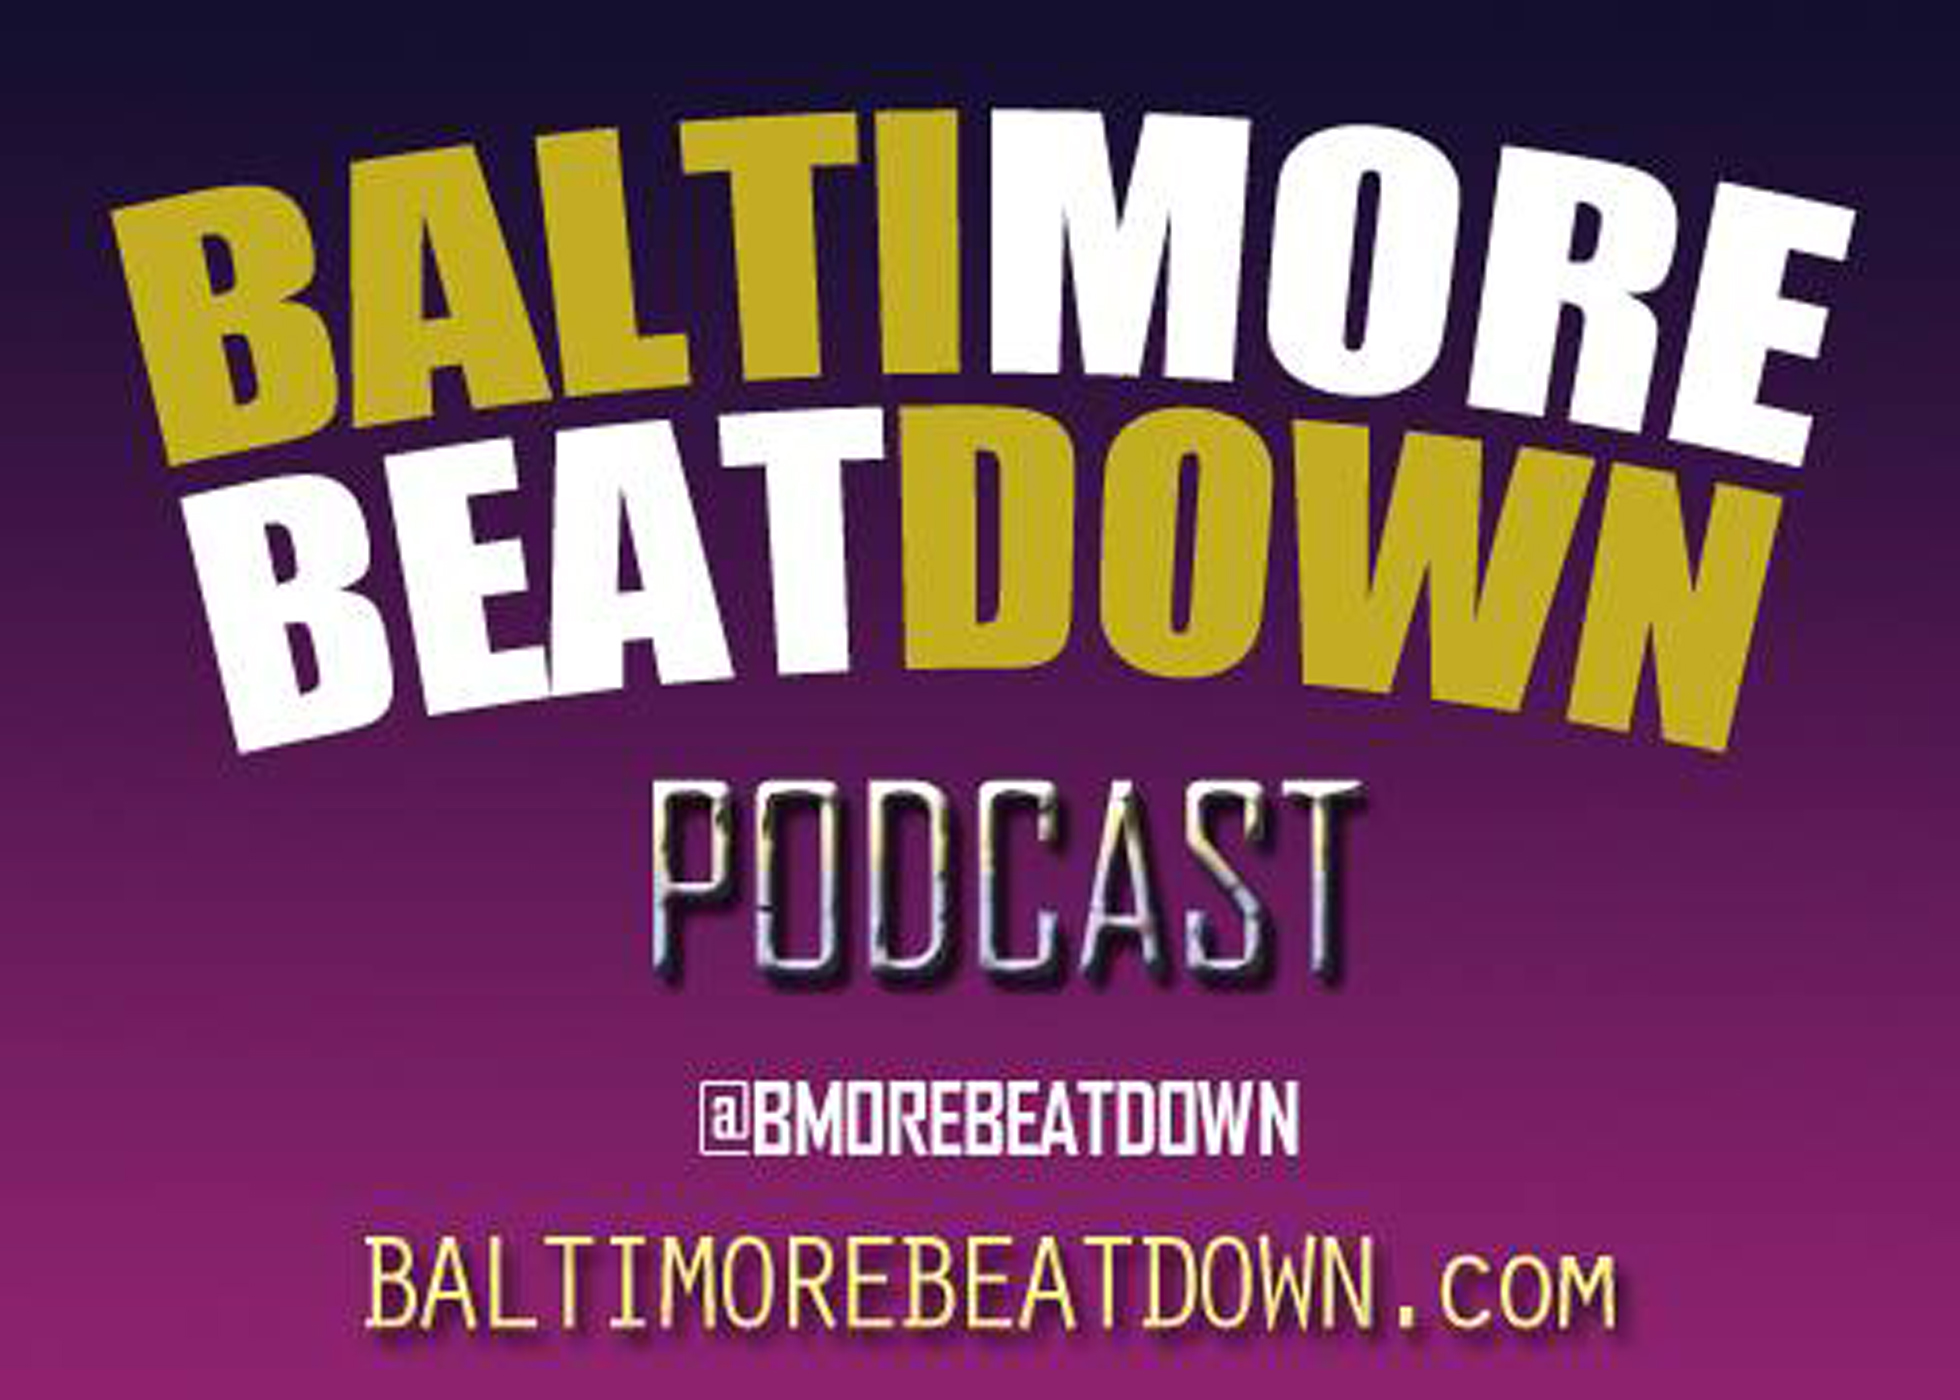 BaltimoreBeatdownPodcast